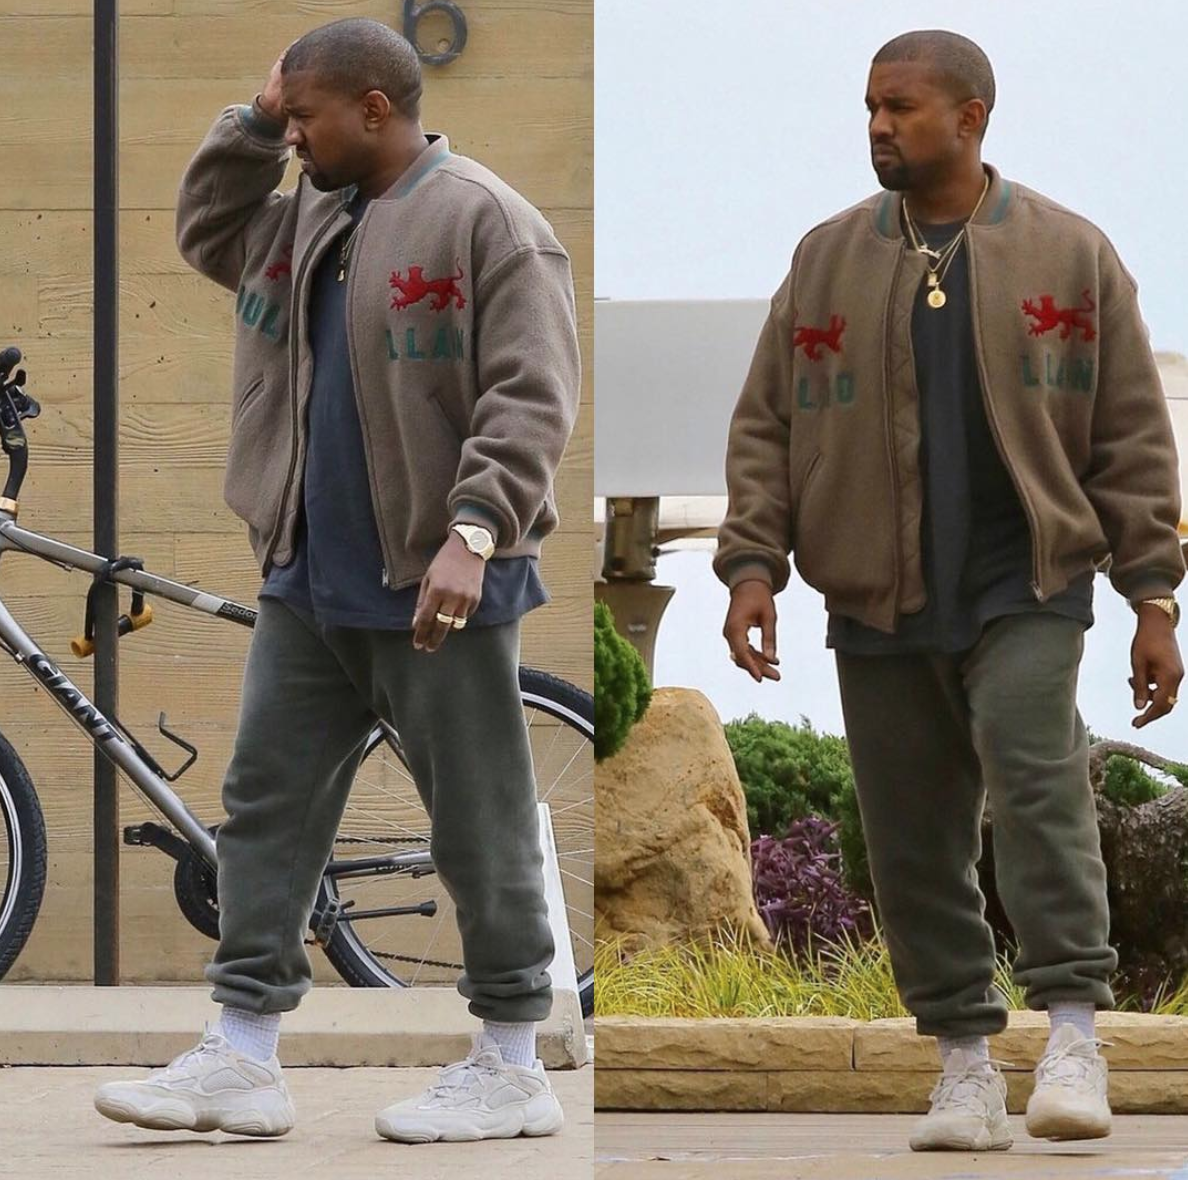 8fdc85ca8 SPOTTED  Kayne West In YEEZY Season 5 Jacket And adidas YEEZY Mud Rat 500  Sneakers – PAUSE Online